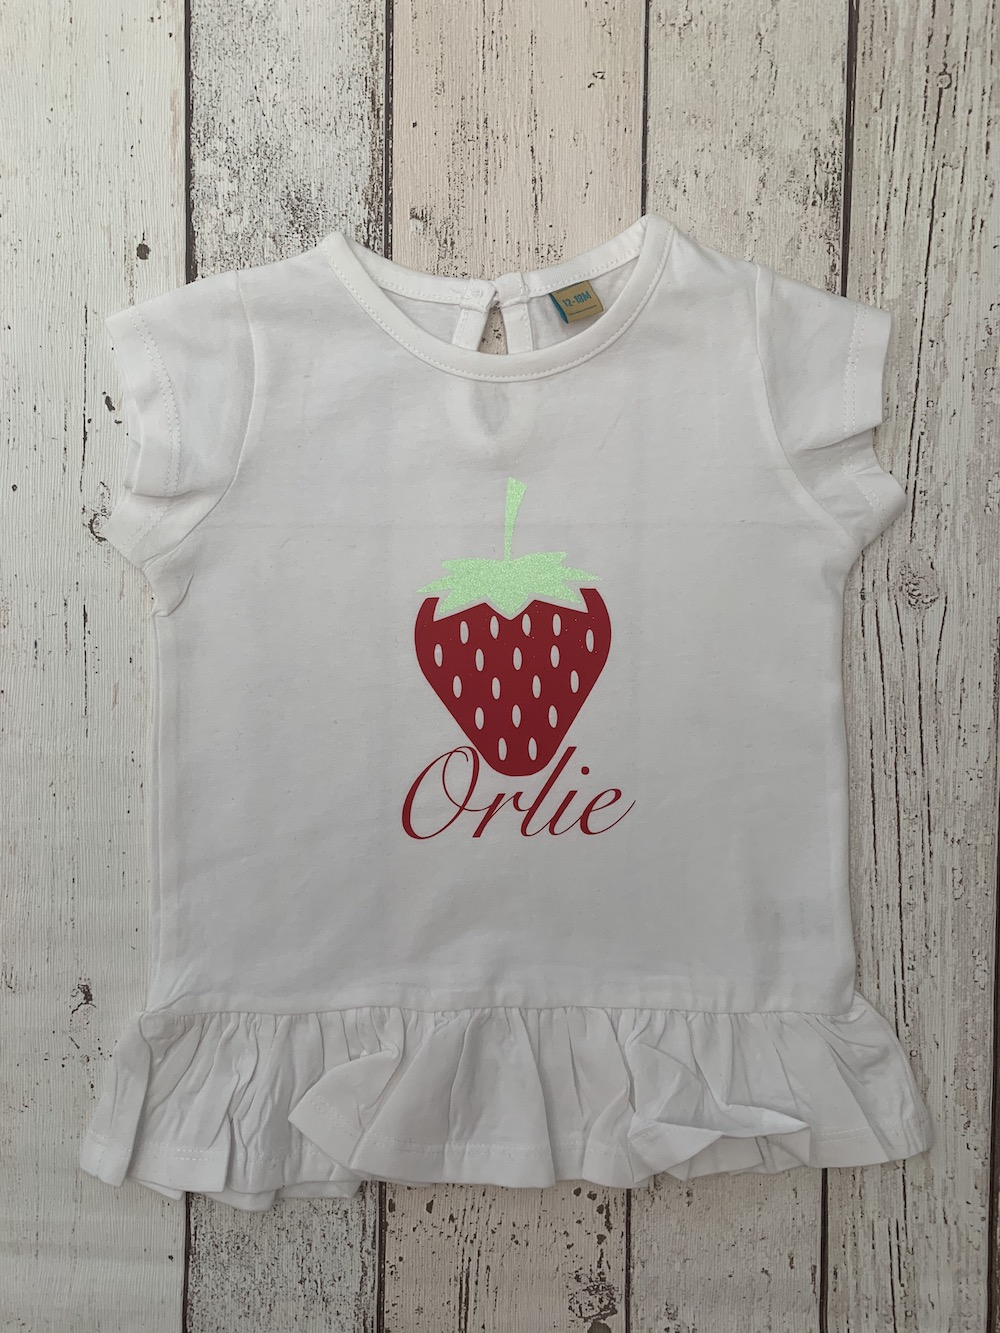 Personalised Frill Longline Tshirt – Strawberry